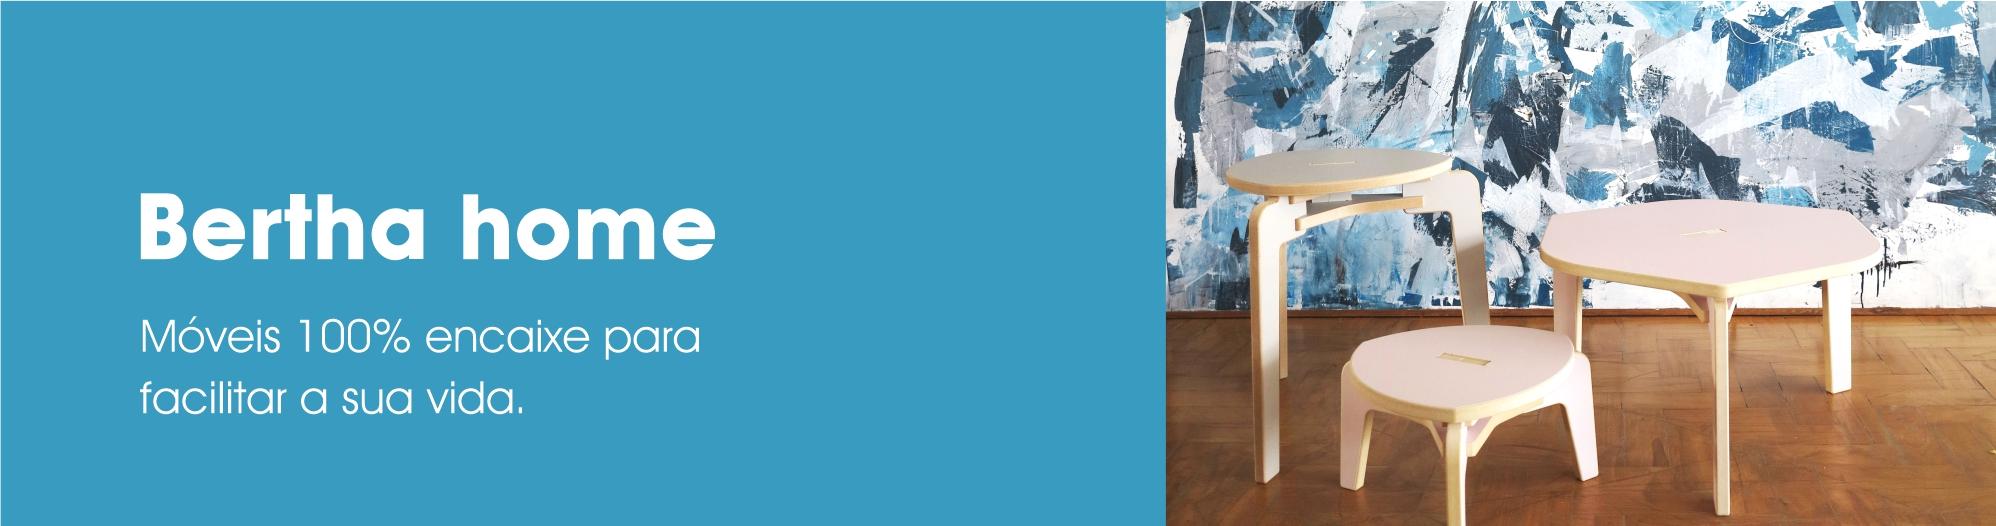 Banner - tela azul bancos e mesa